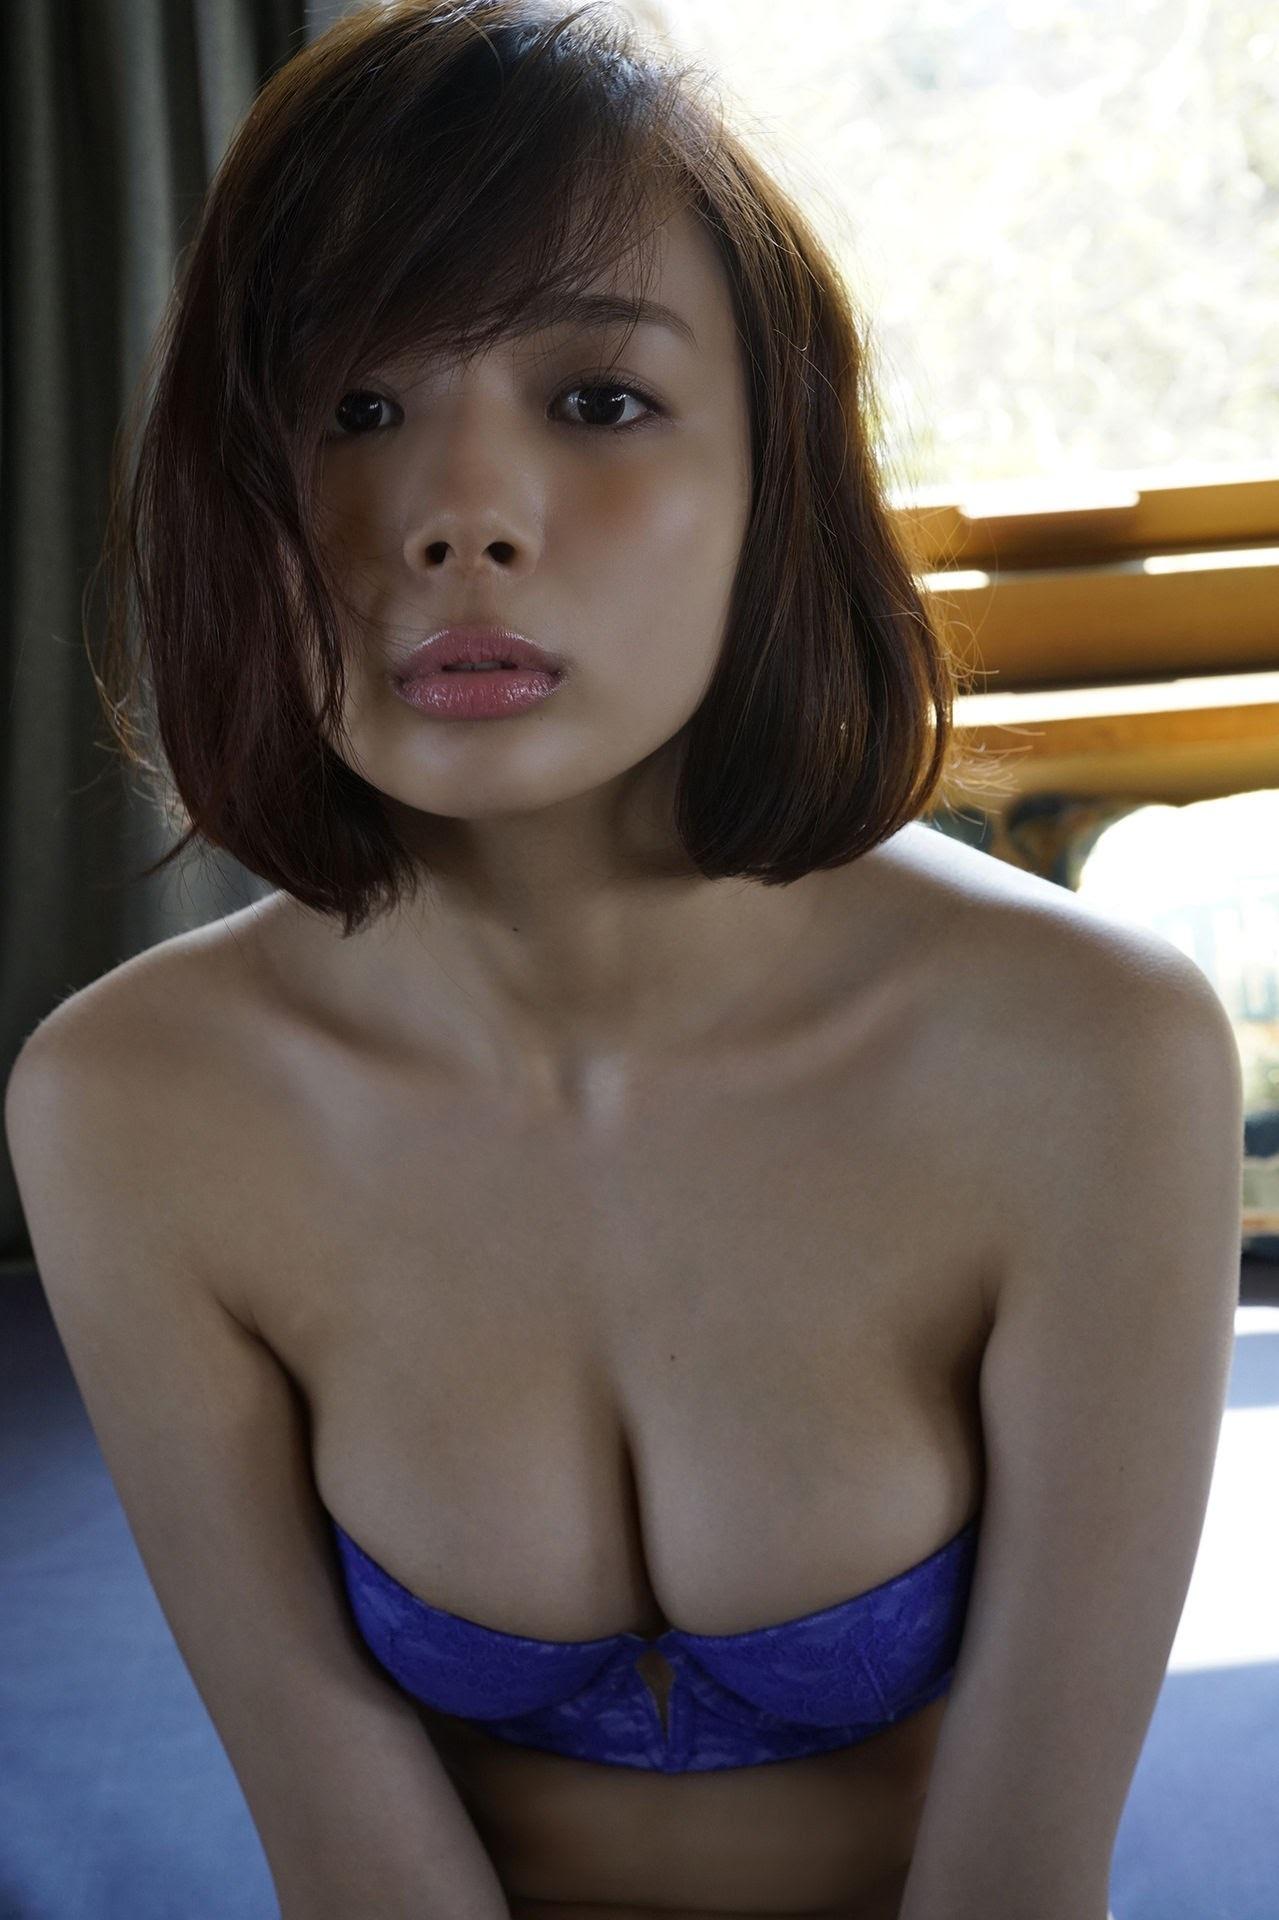 23 years old Shaka Okada, who is also a professional mahjong player025